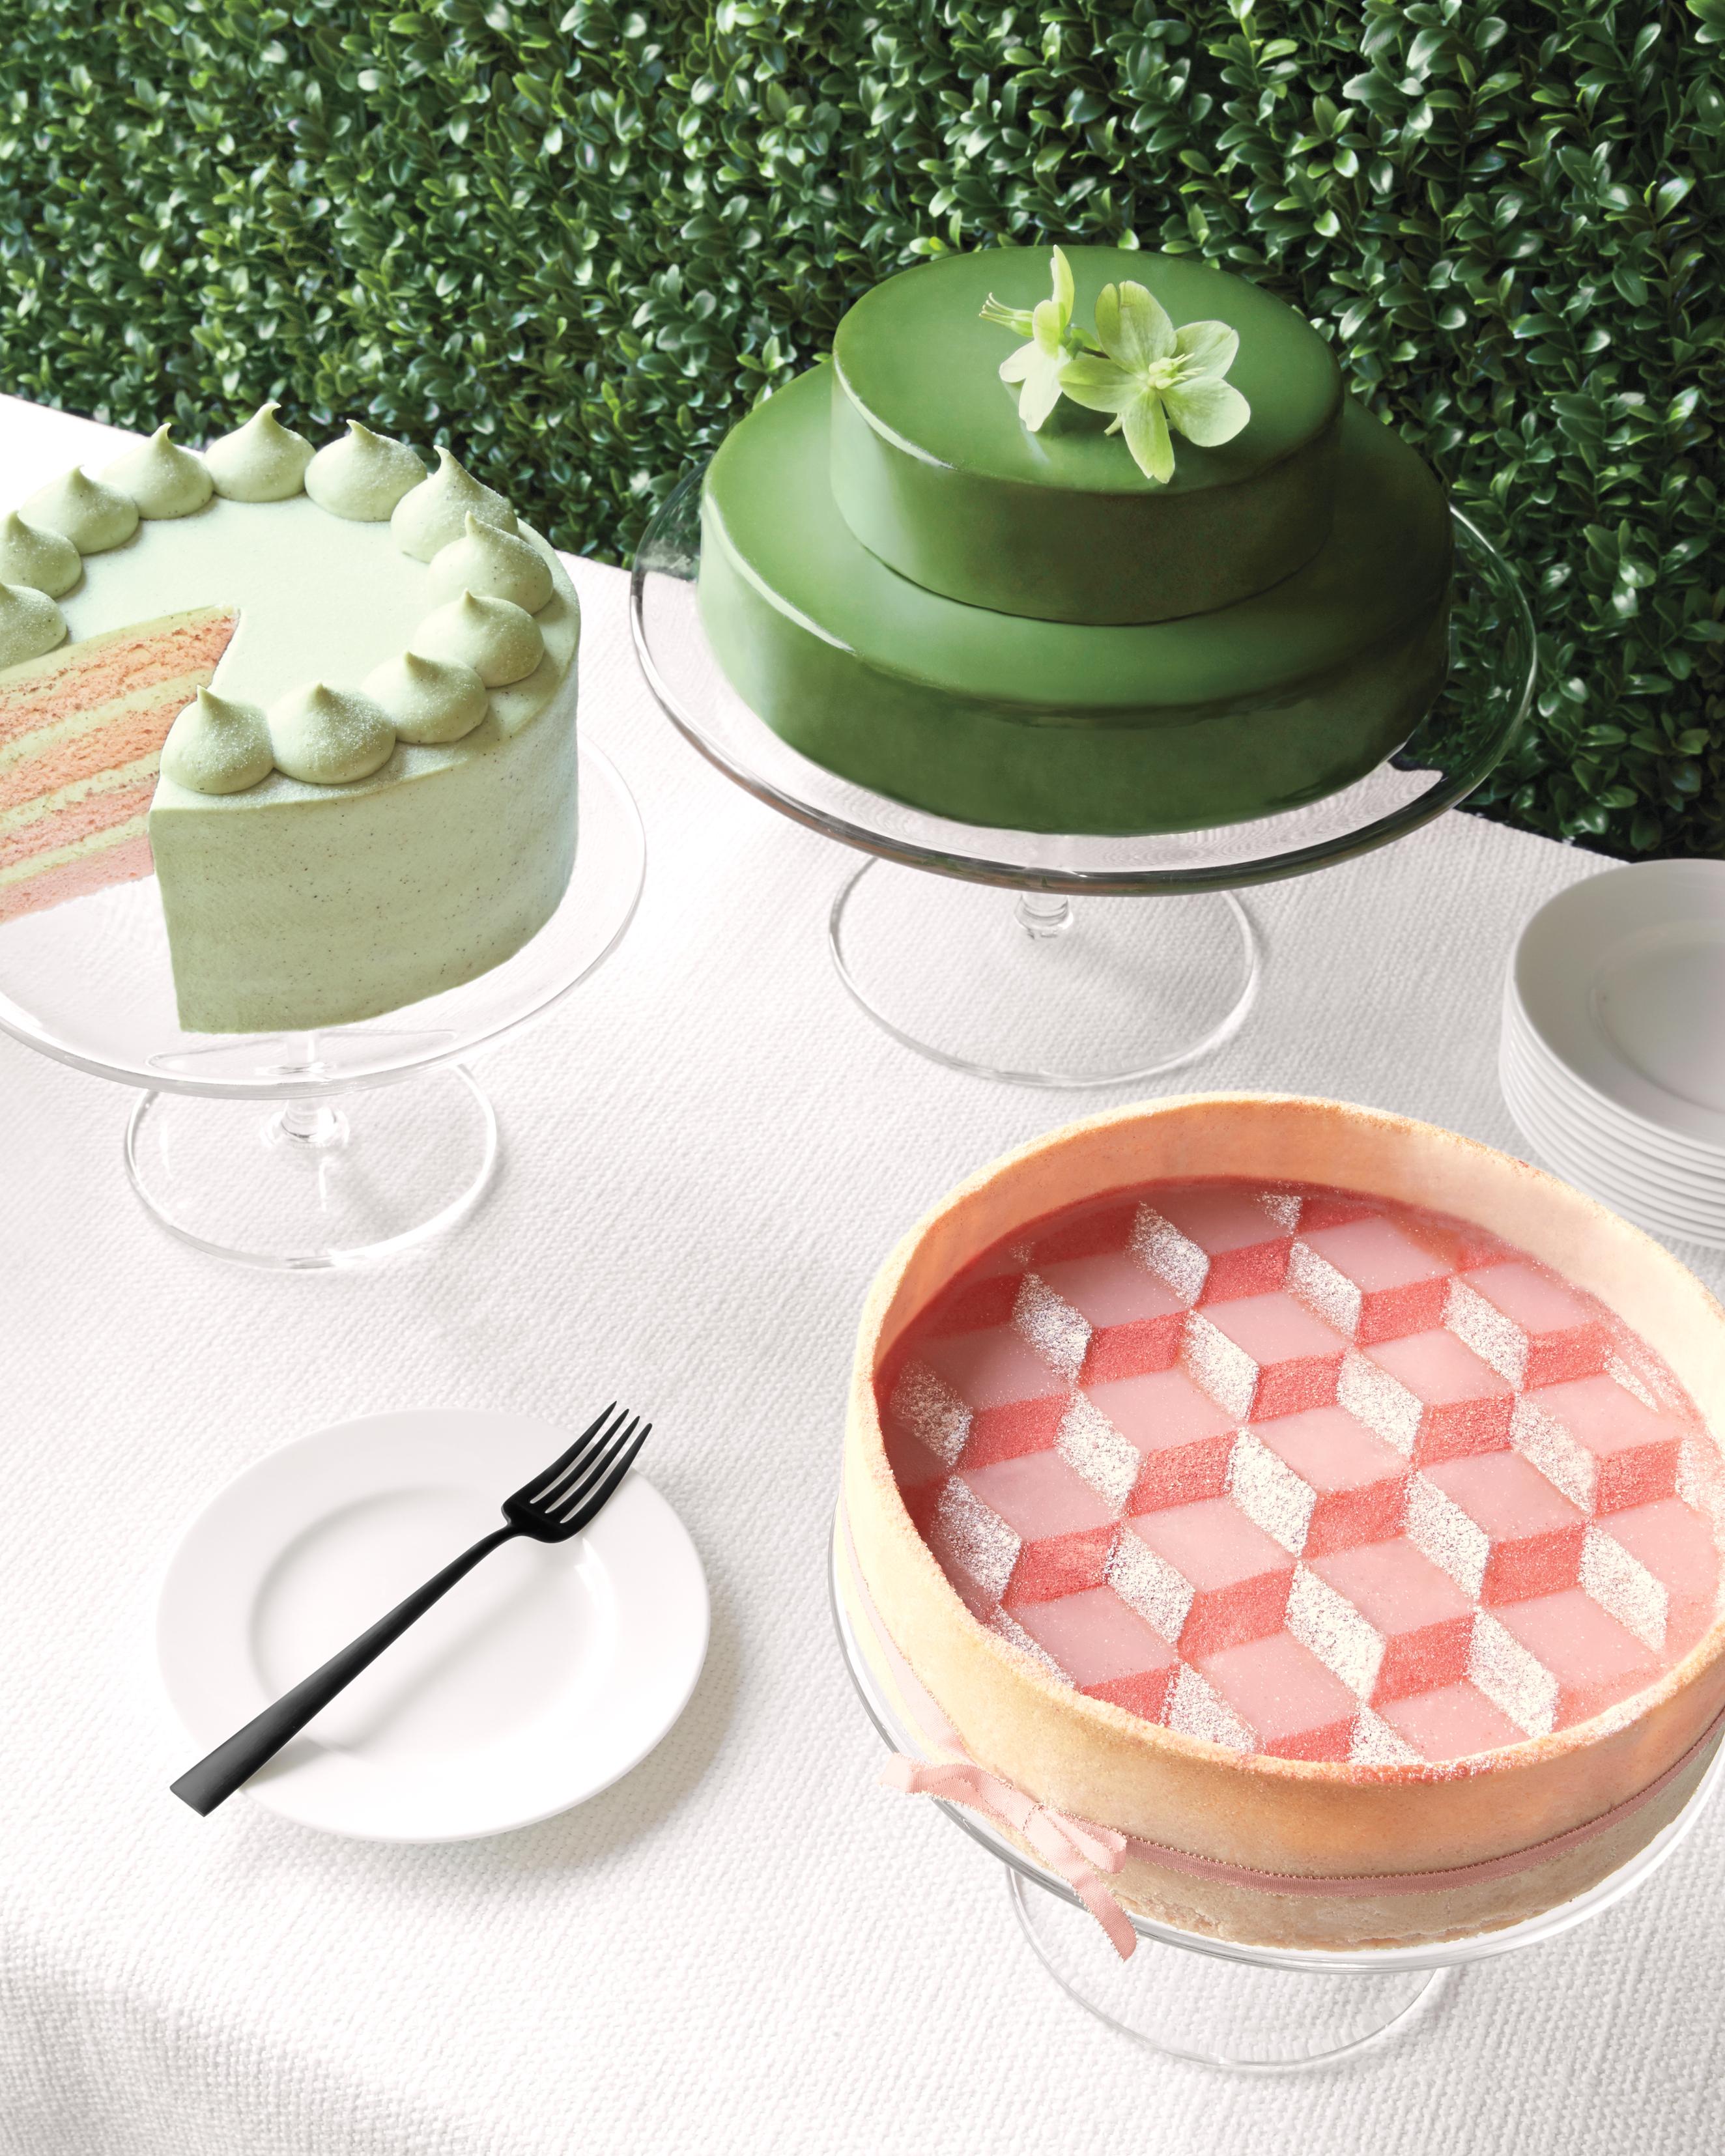 cakes-329-d111274.jpg